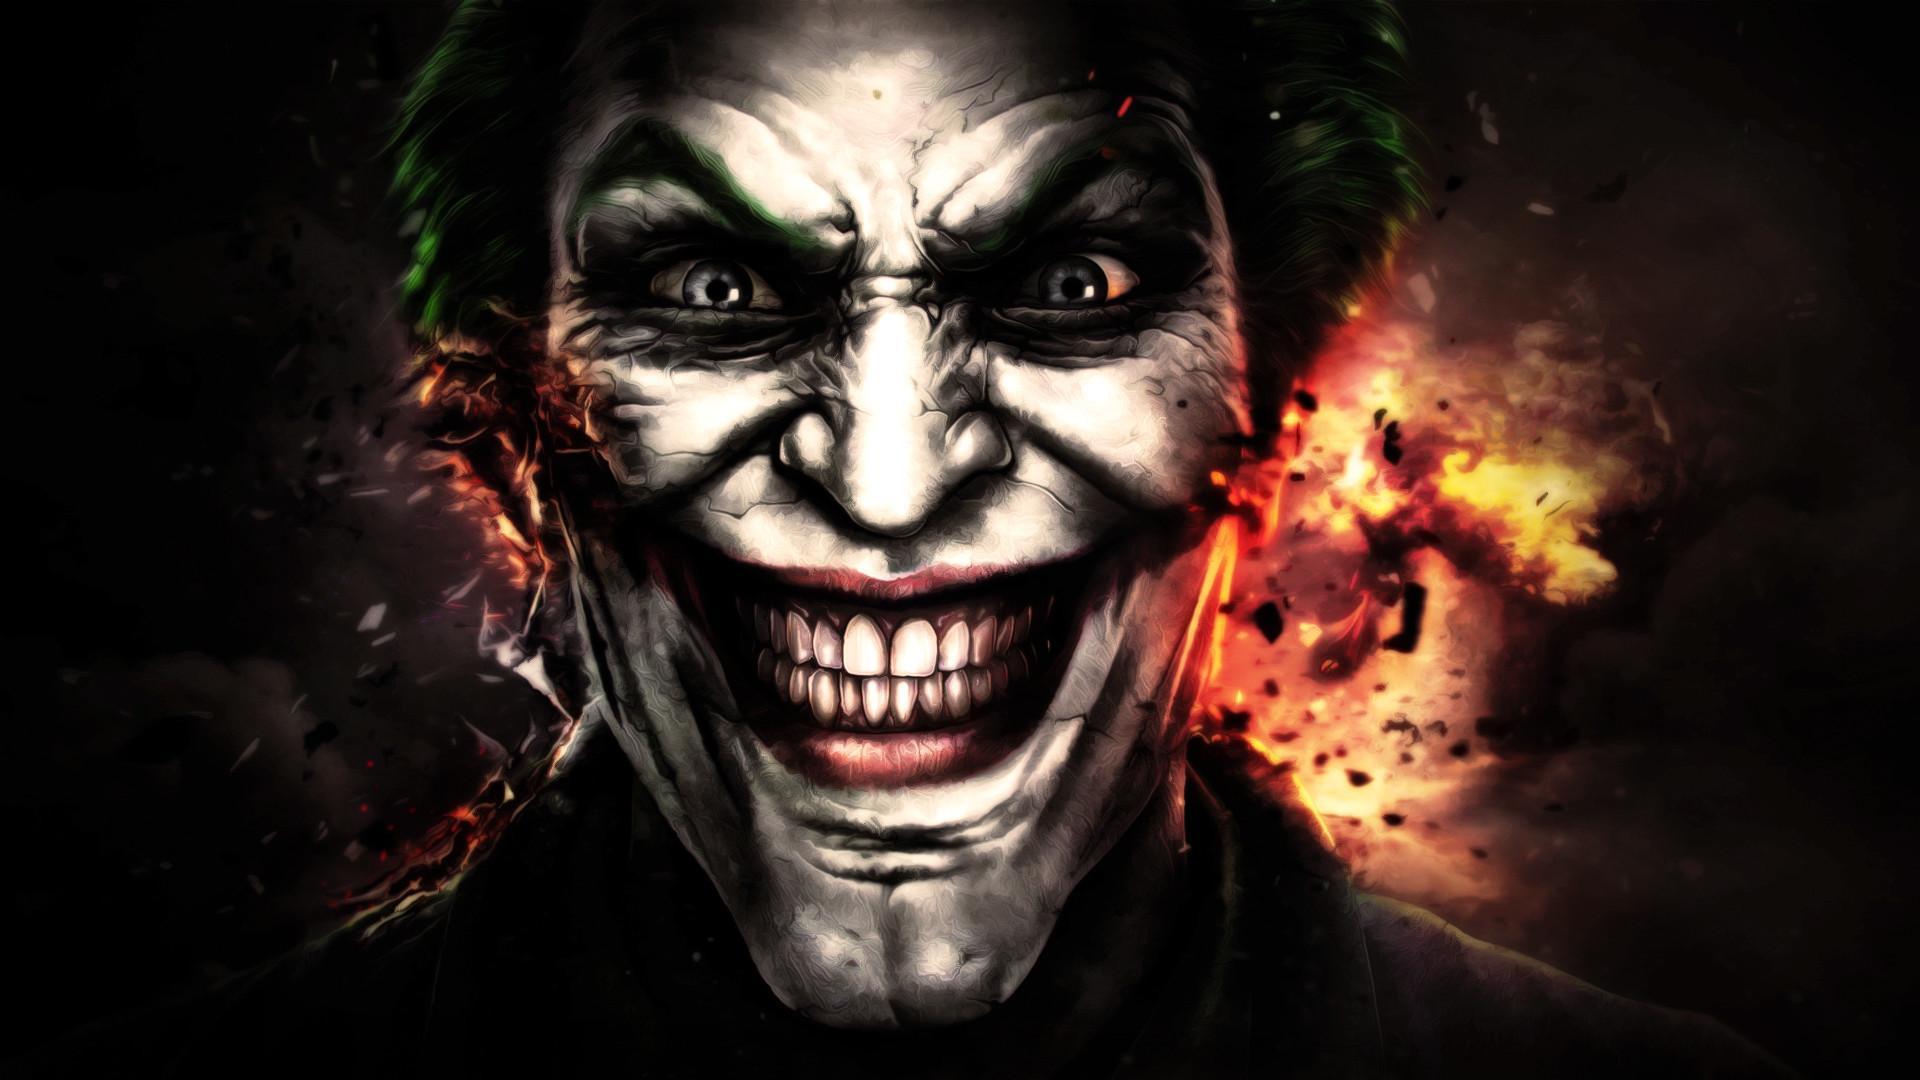 Horror Joker Wallpapers - Wallpaper Cave